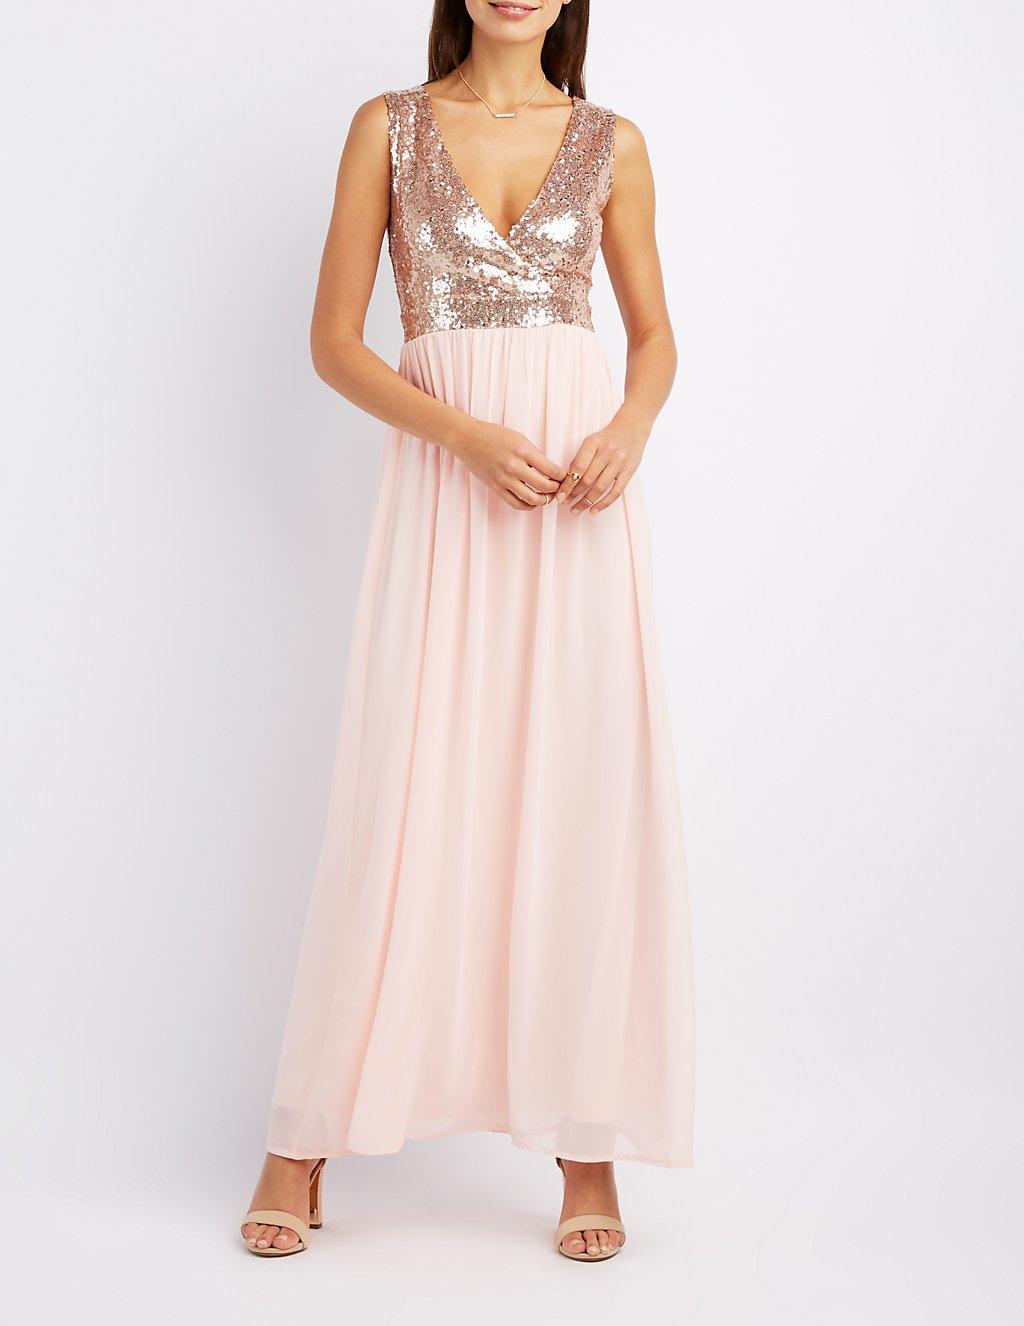 Sequin & Chiffon Maxi Dress | Charlotte Russe